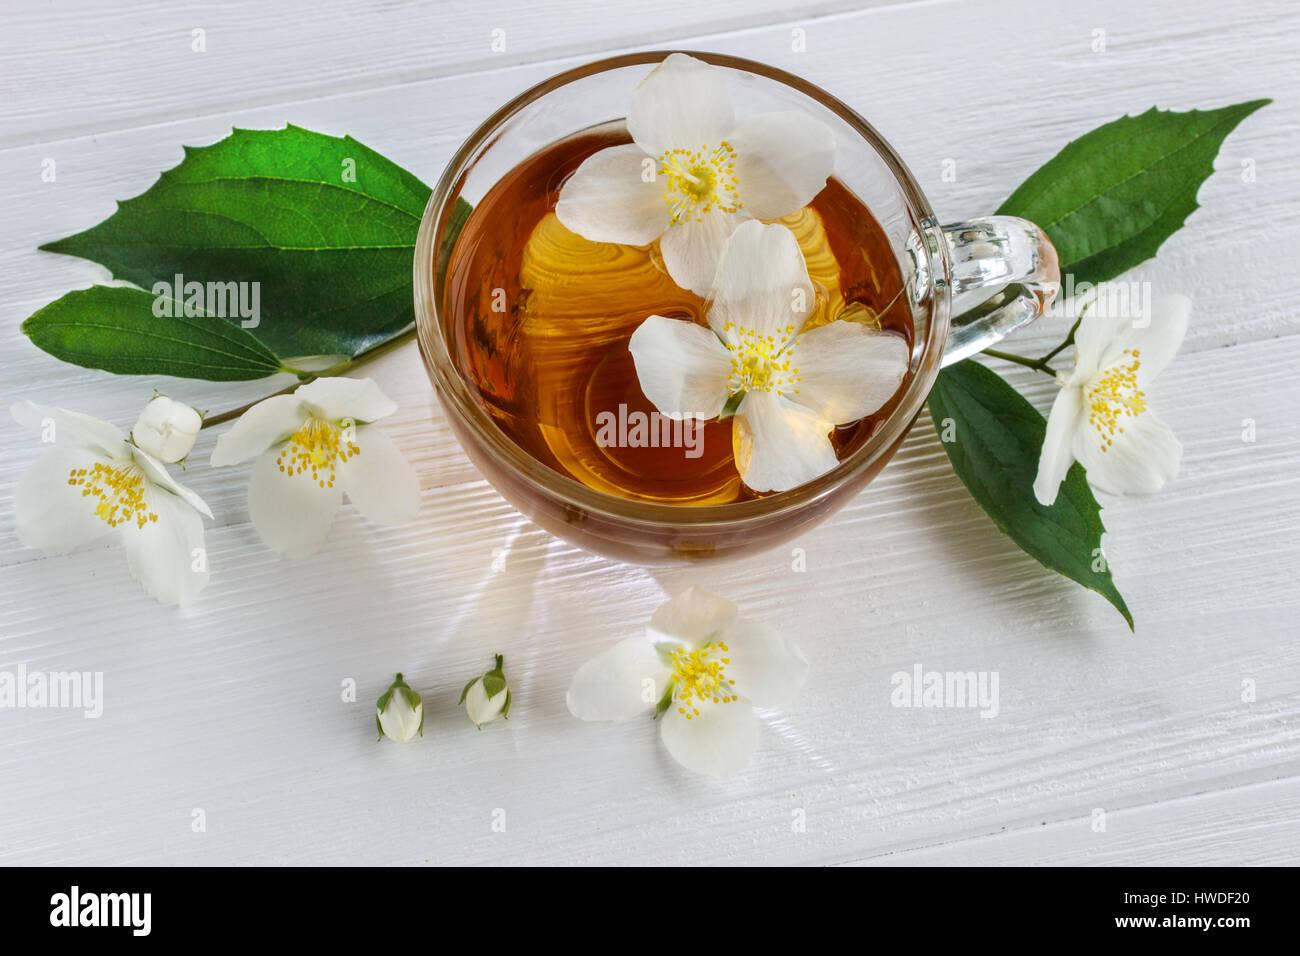 Jasmine Tea And Jasmine Flowers On Wooden Old Background Stock Photo